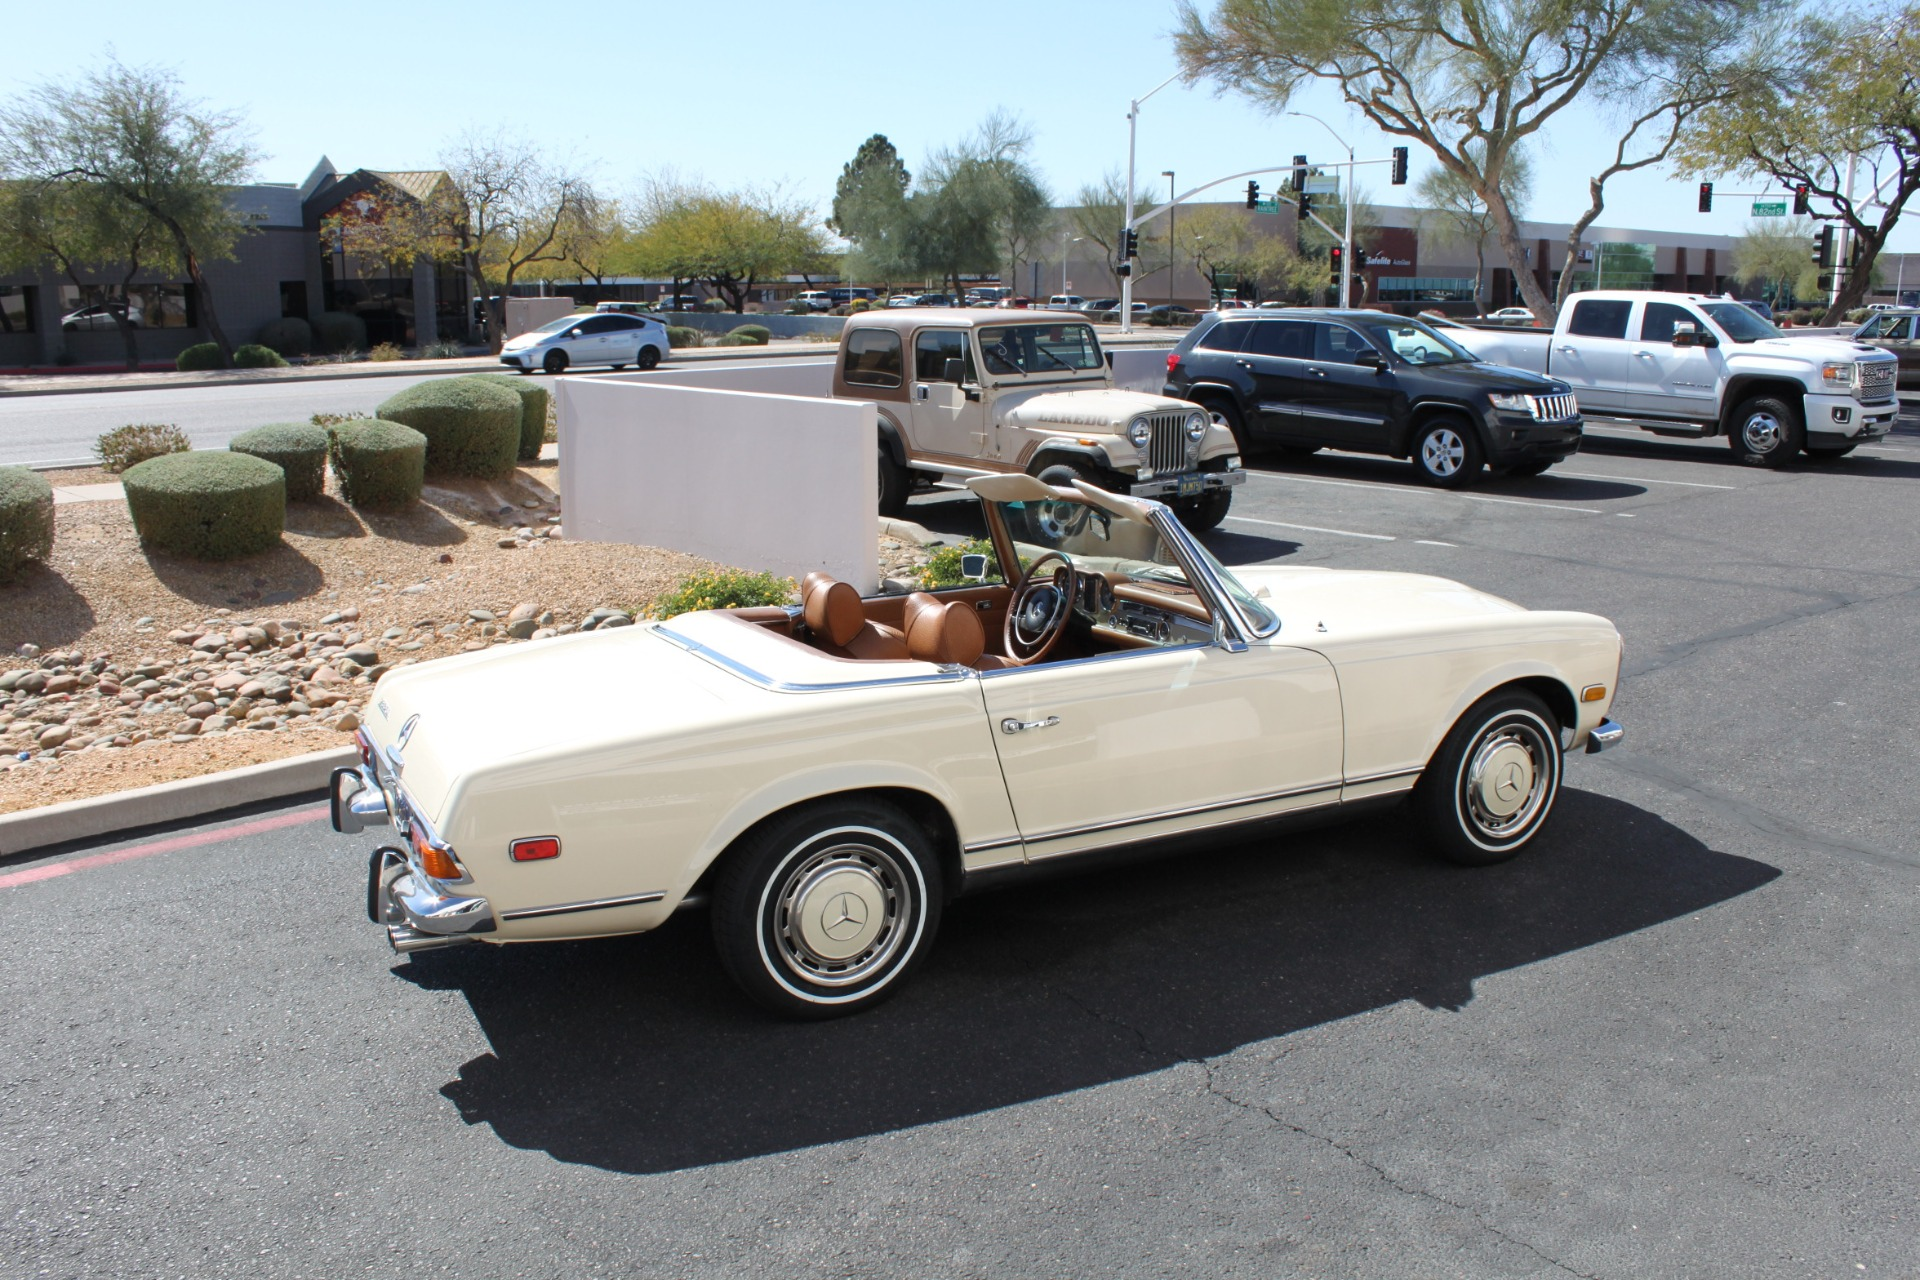 Used-1971-Mercedes-Benz-280SL-Convertible-Wrangler